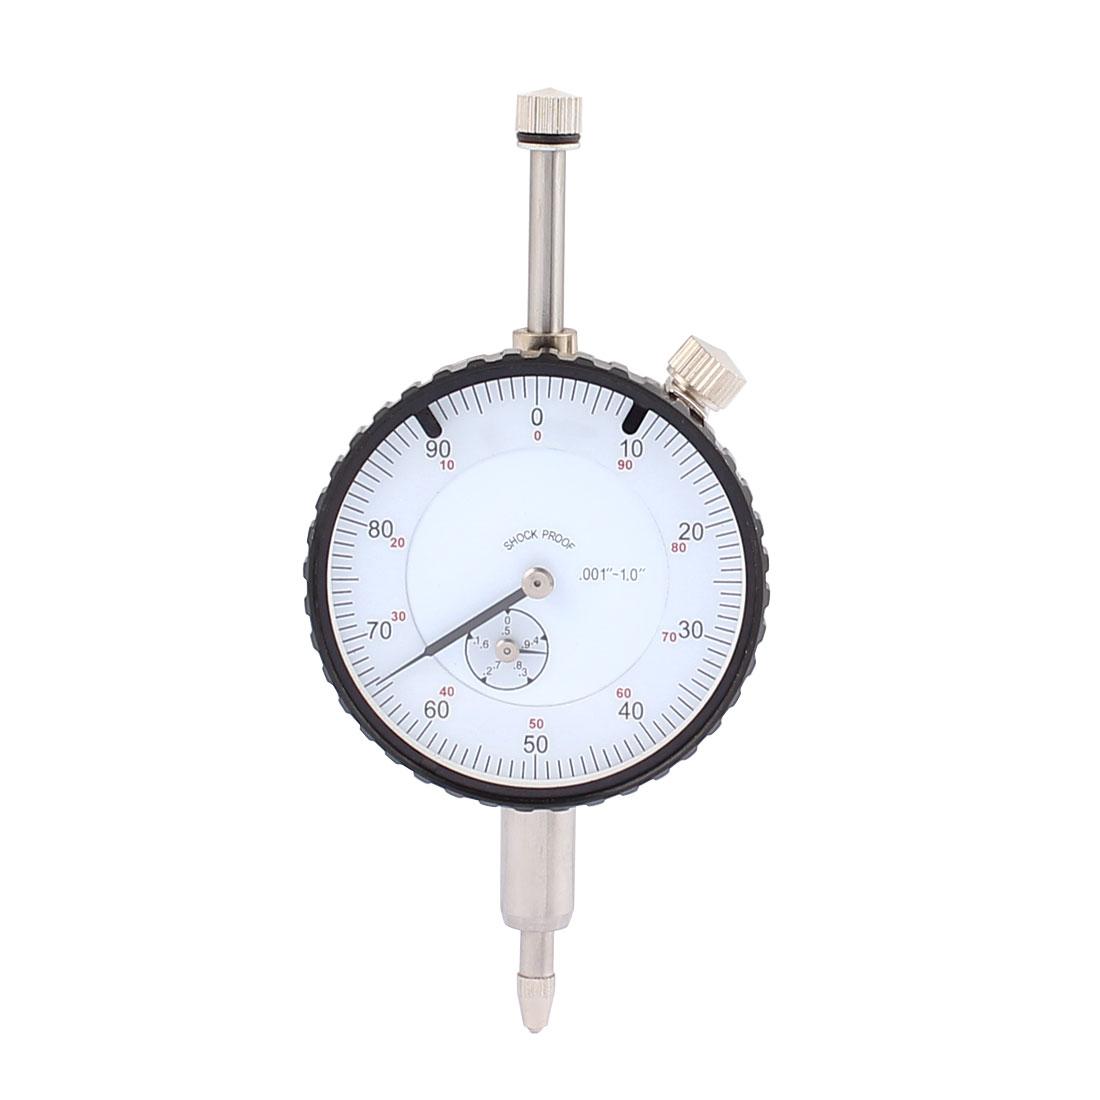 0-1inch Range Measurement Instrument Dial Indicator Gauge Precision Tool B-04